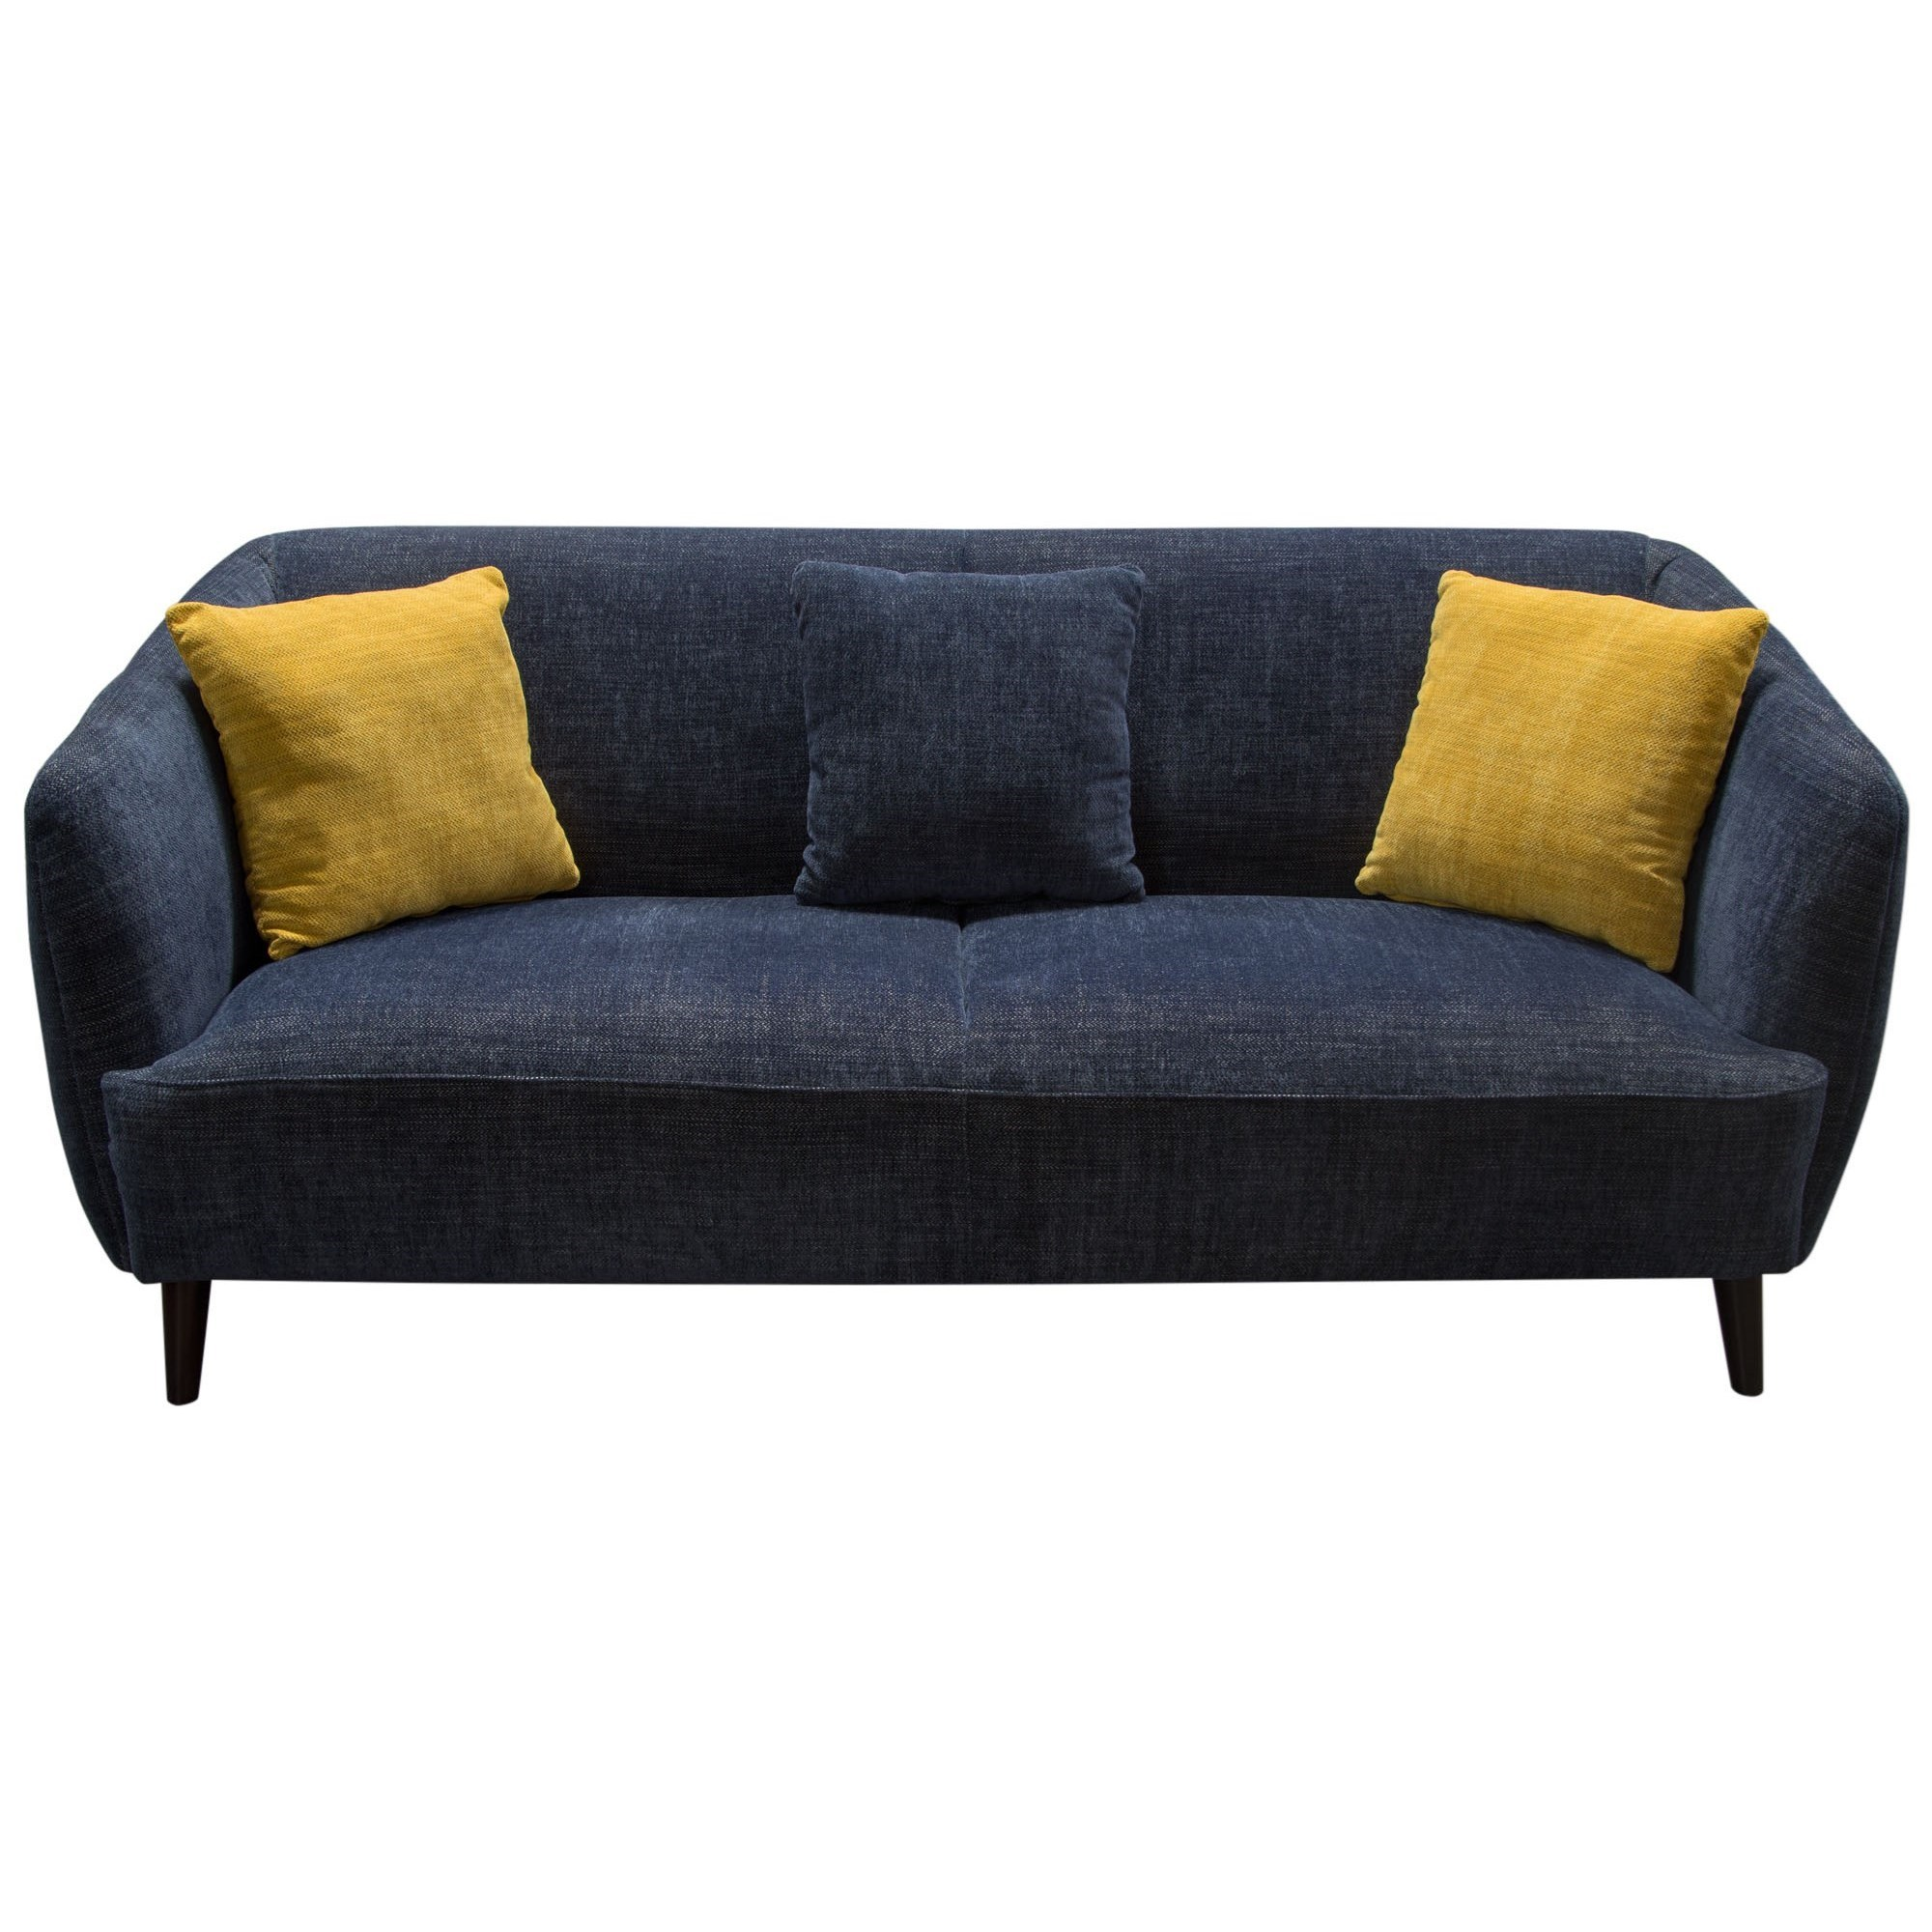 angled sofa legs modern bed queen size diamond de luca delucasobu with